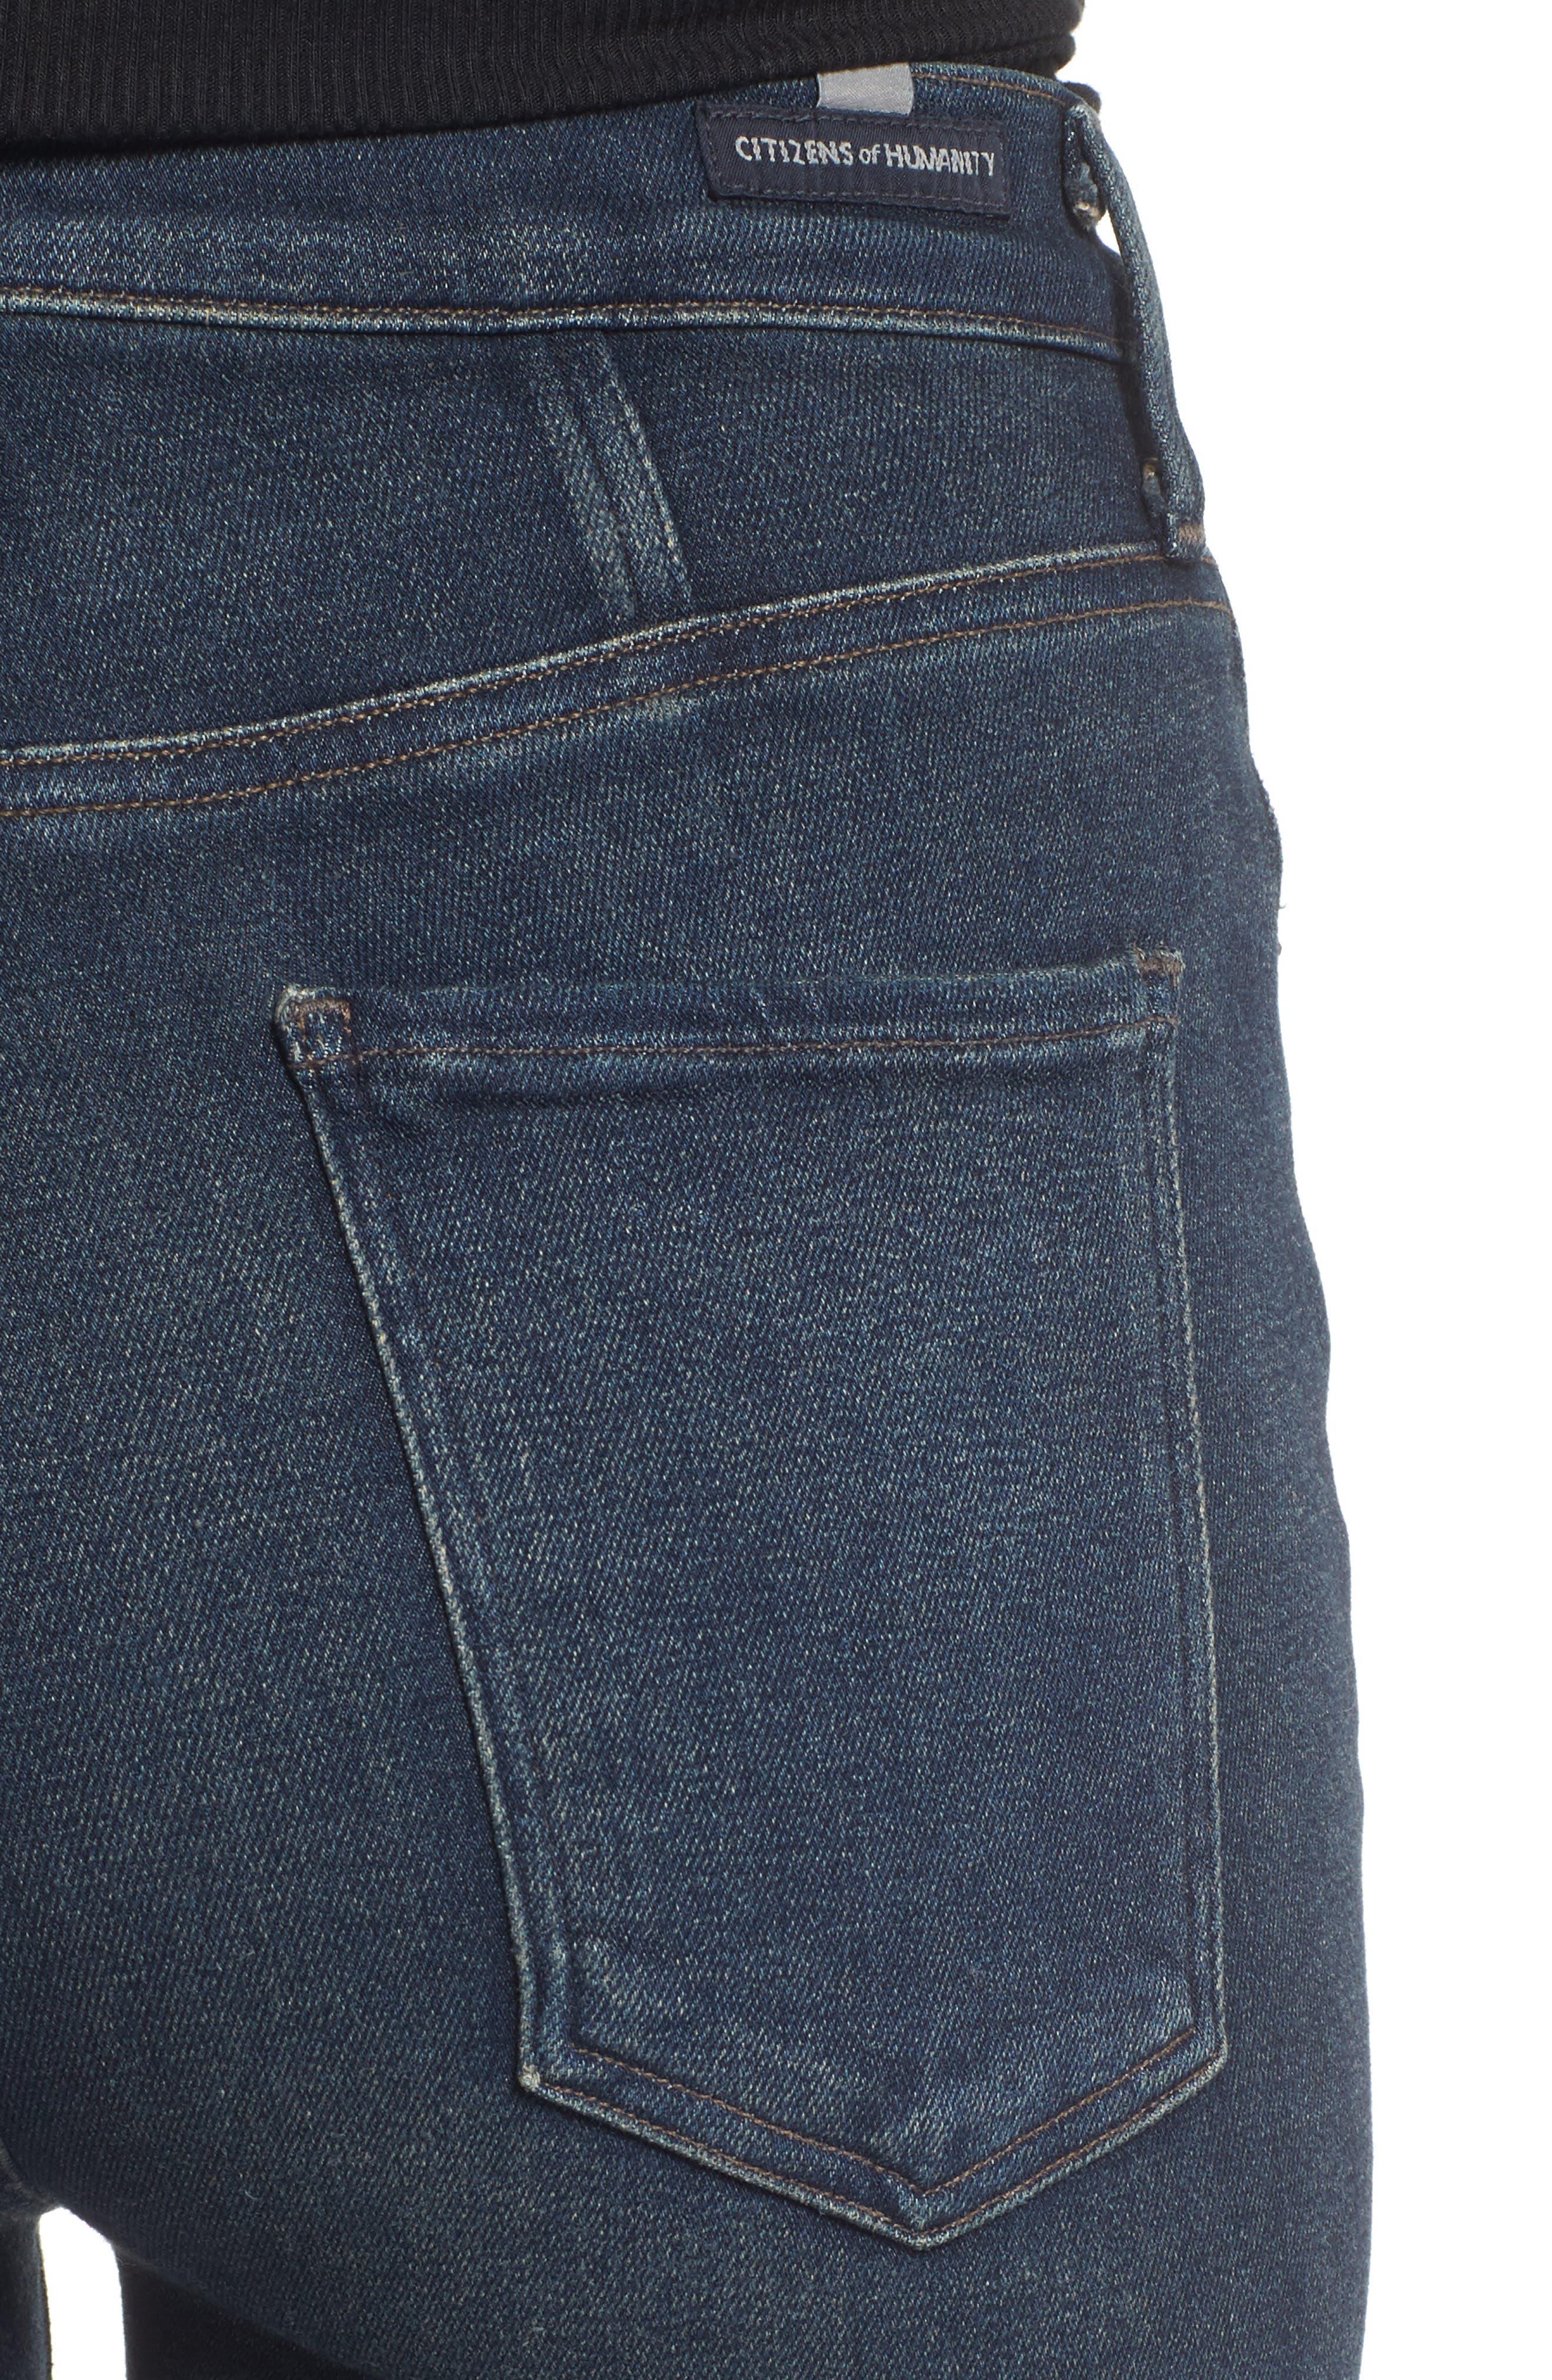 Alternate Image 4  - Citizens of Humanity Chrissy High Waist Skinny Jeans (Haze)